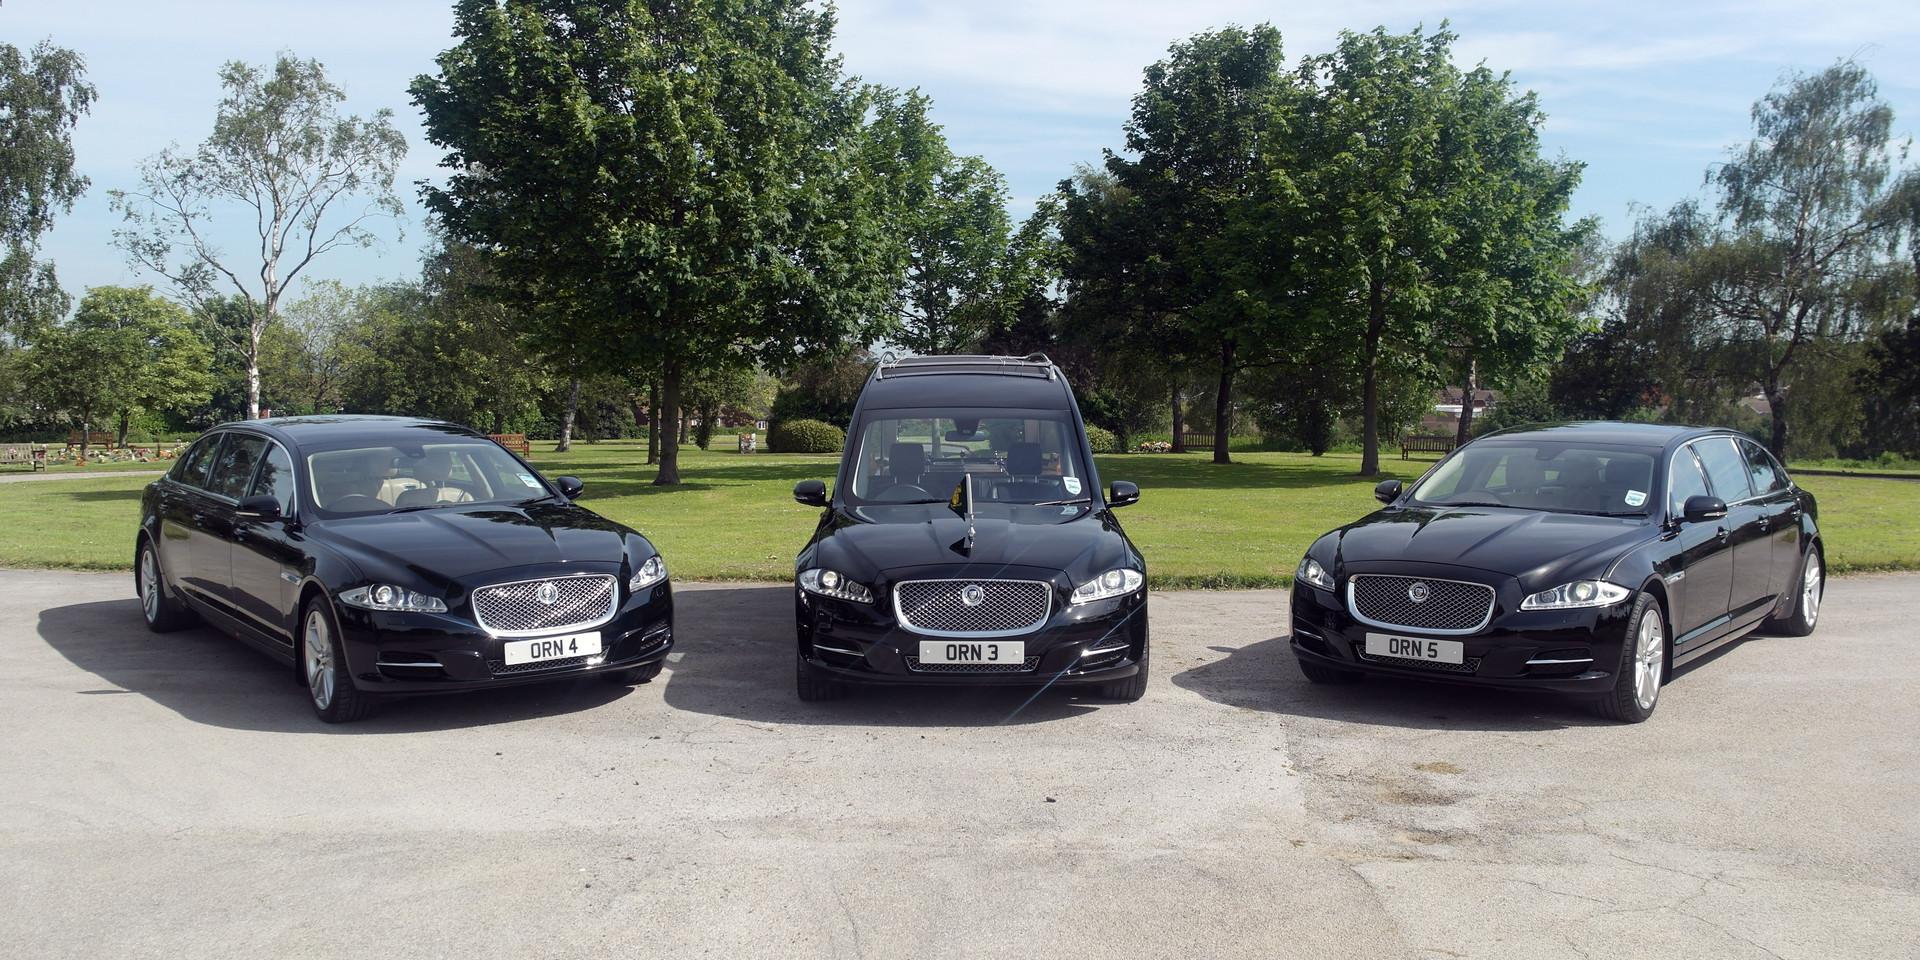 Jaguar XJ Fleet